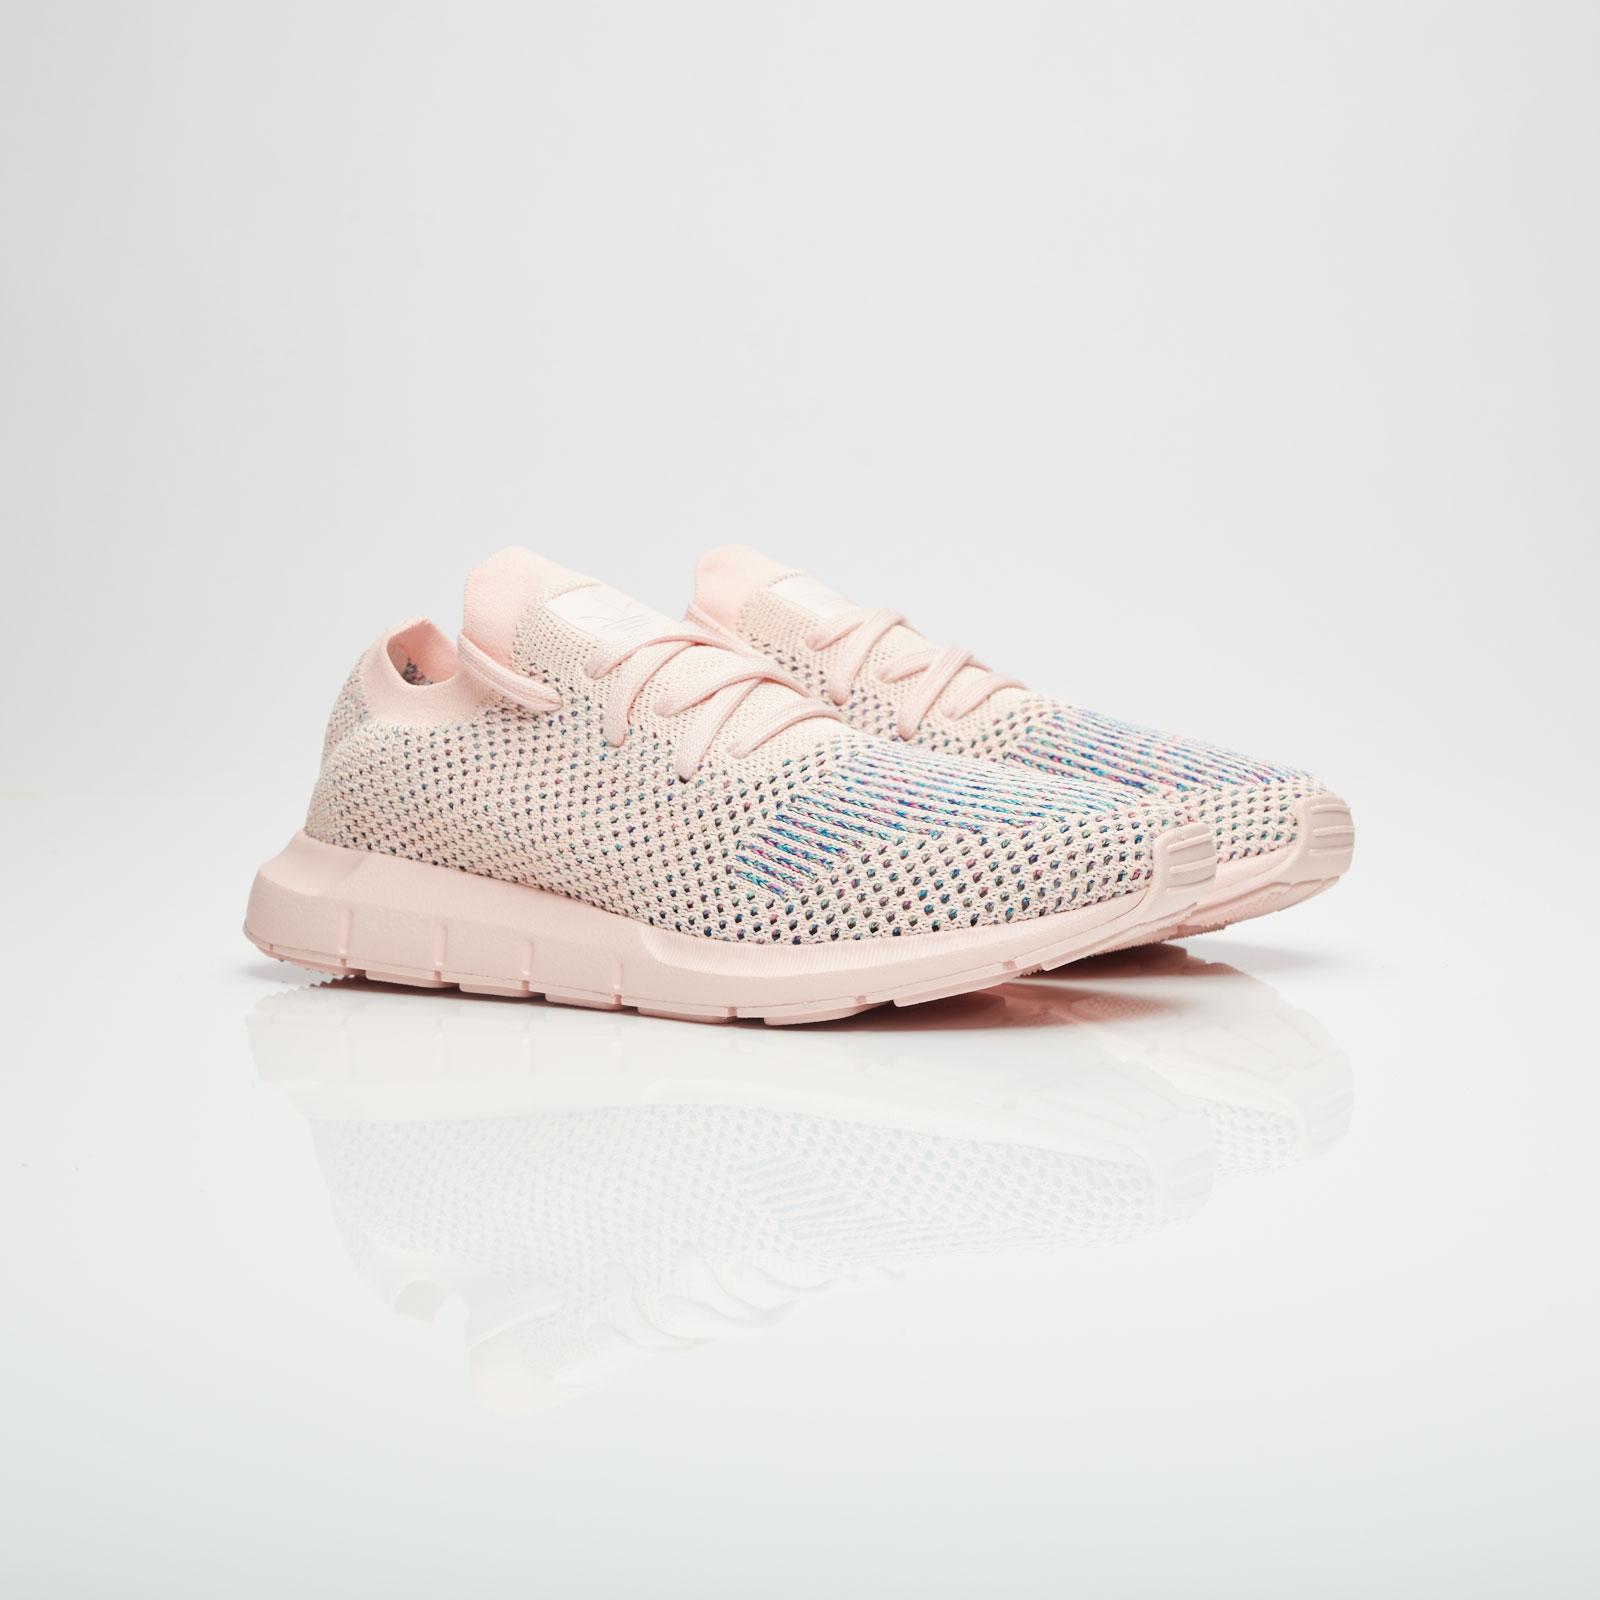 adidas swift run pk w cg4134 sneakersnstuff scarpe